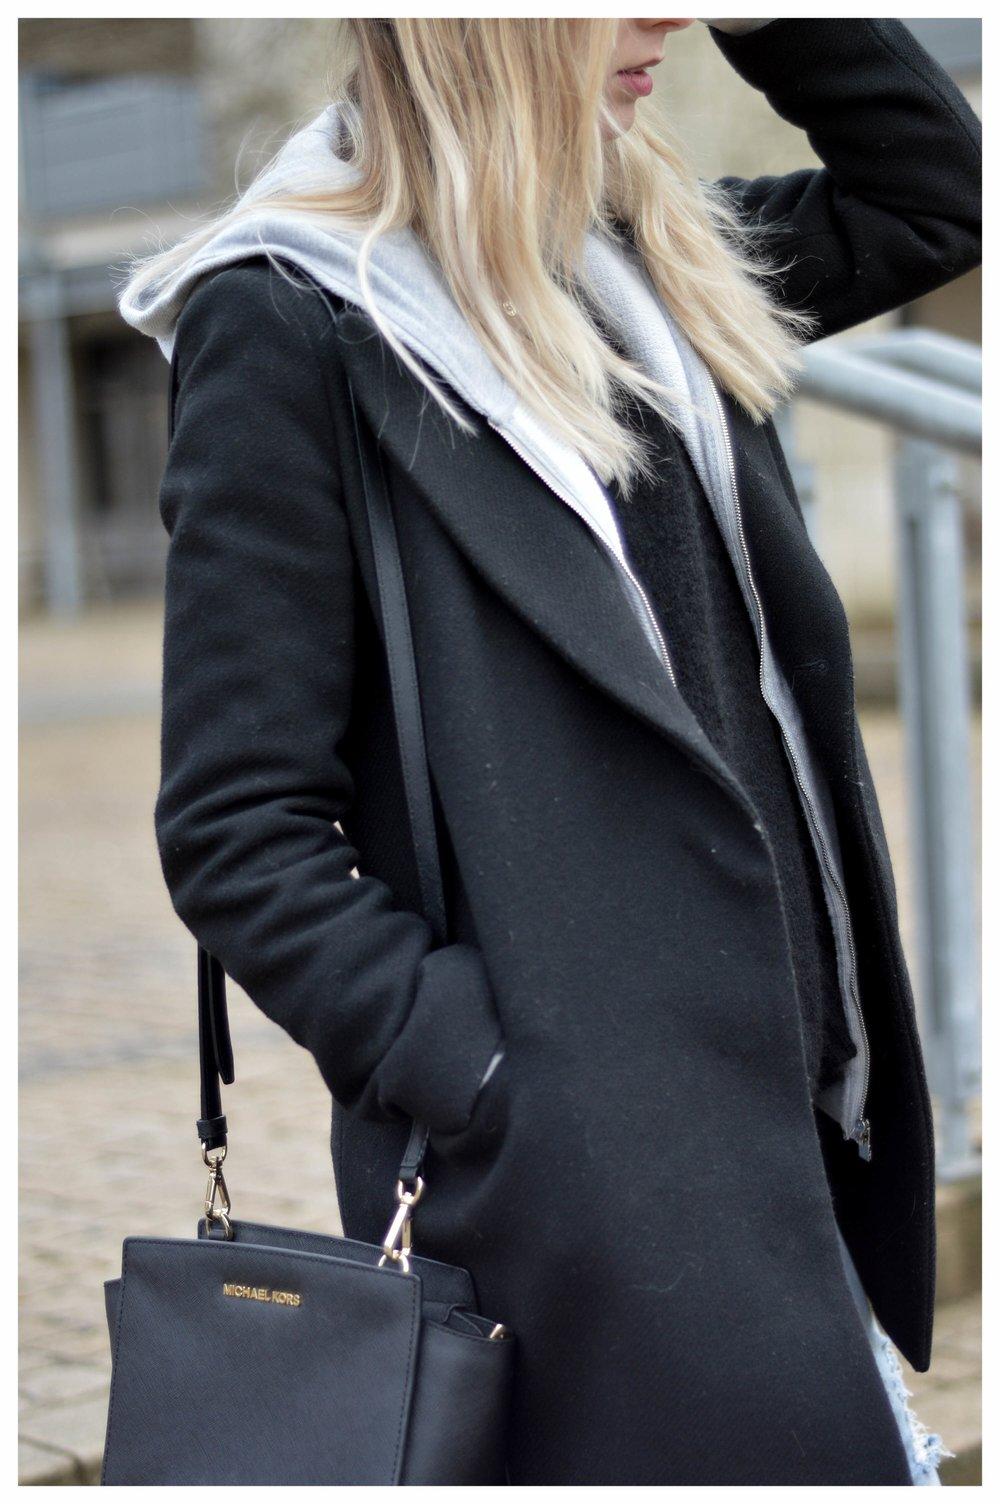 Black Coat Hoodie & Ripped Jeans - OSIARAH.COM (41 sur 54).jpg